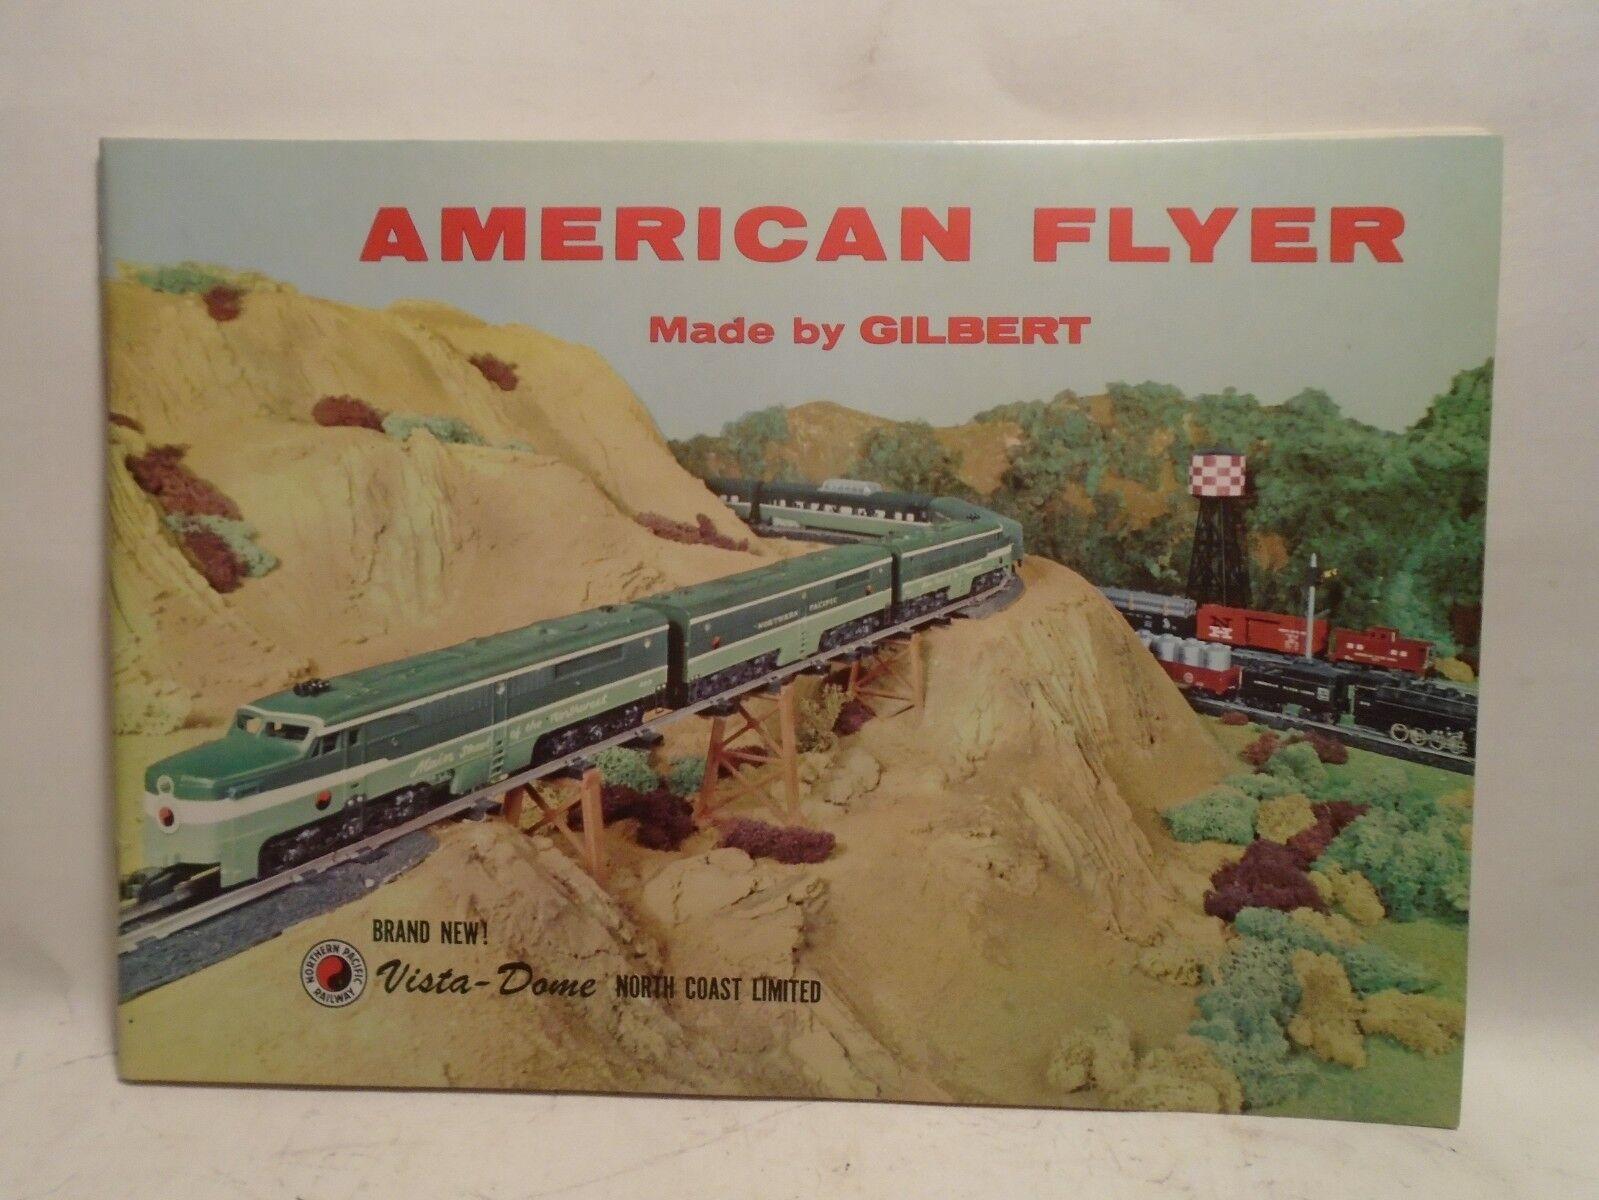 ORIGINAL AMERICAN FLYER 1956 FULL COLOR CATALOG OF TOY TRAINS  D1866 MINT CONDIT